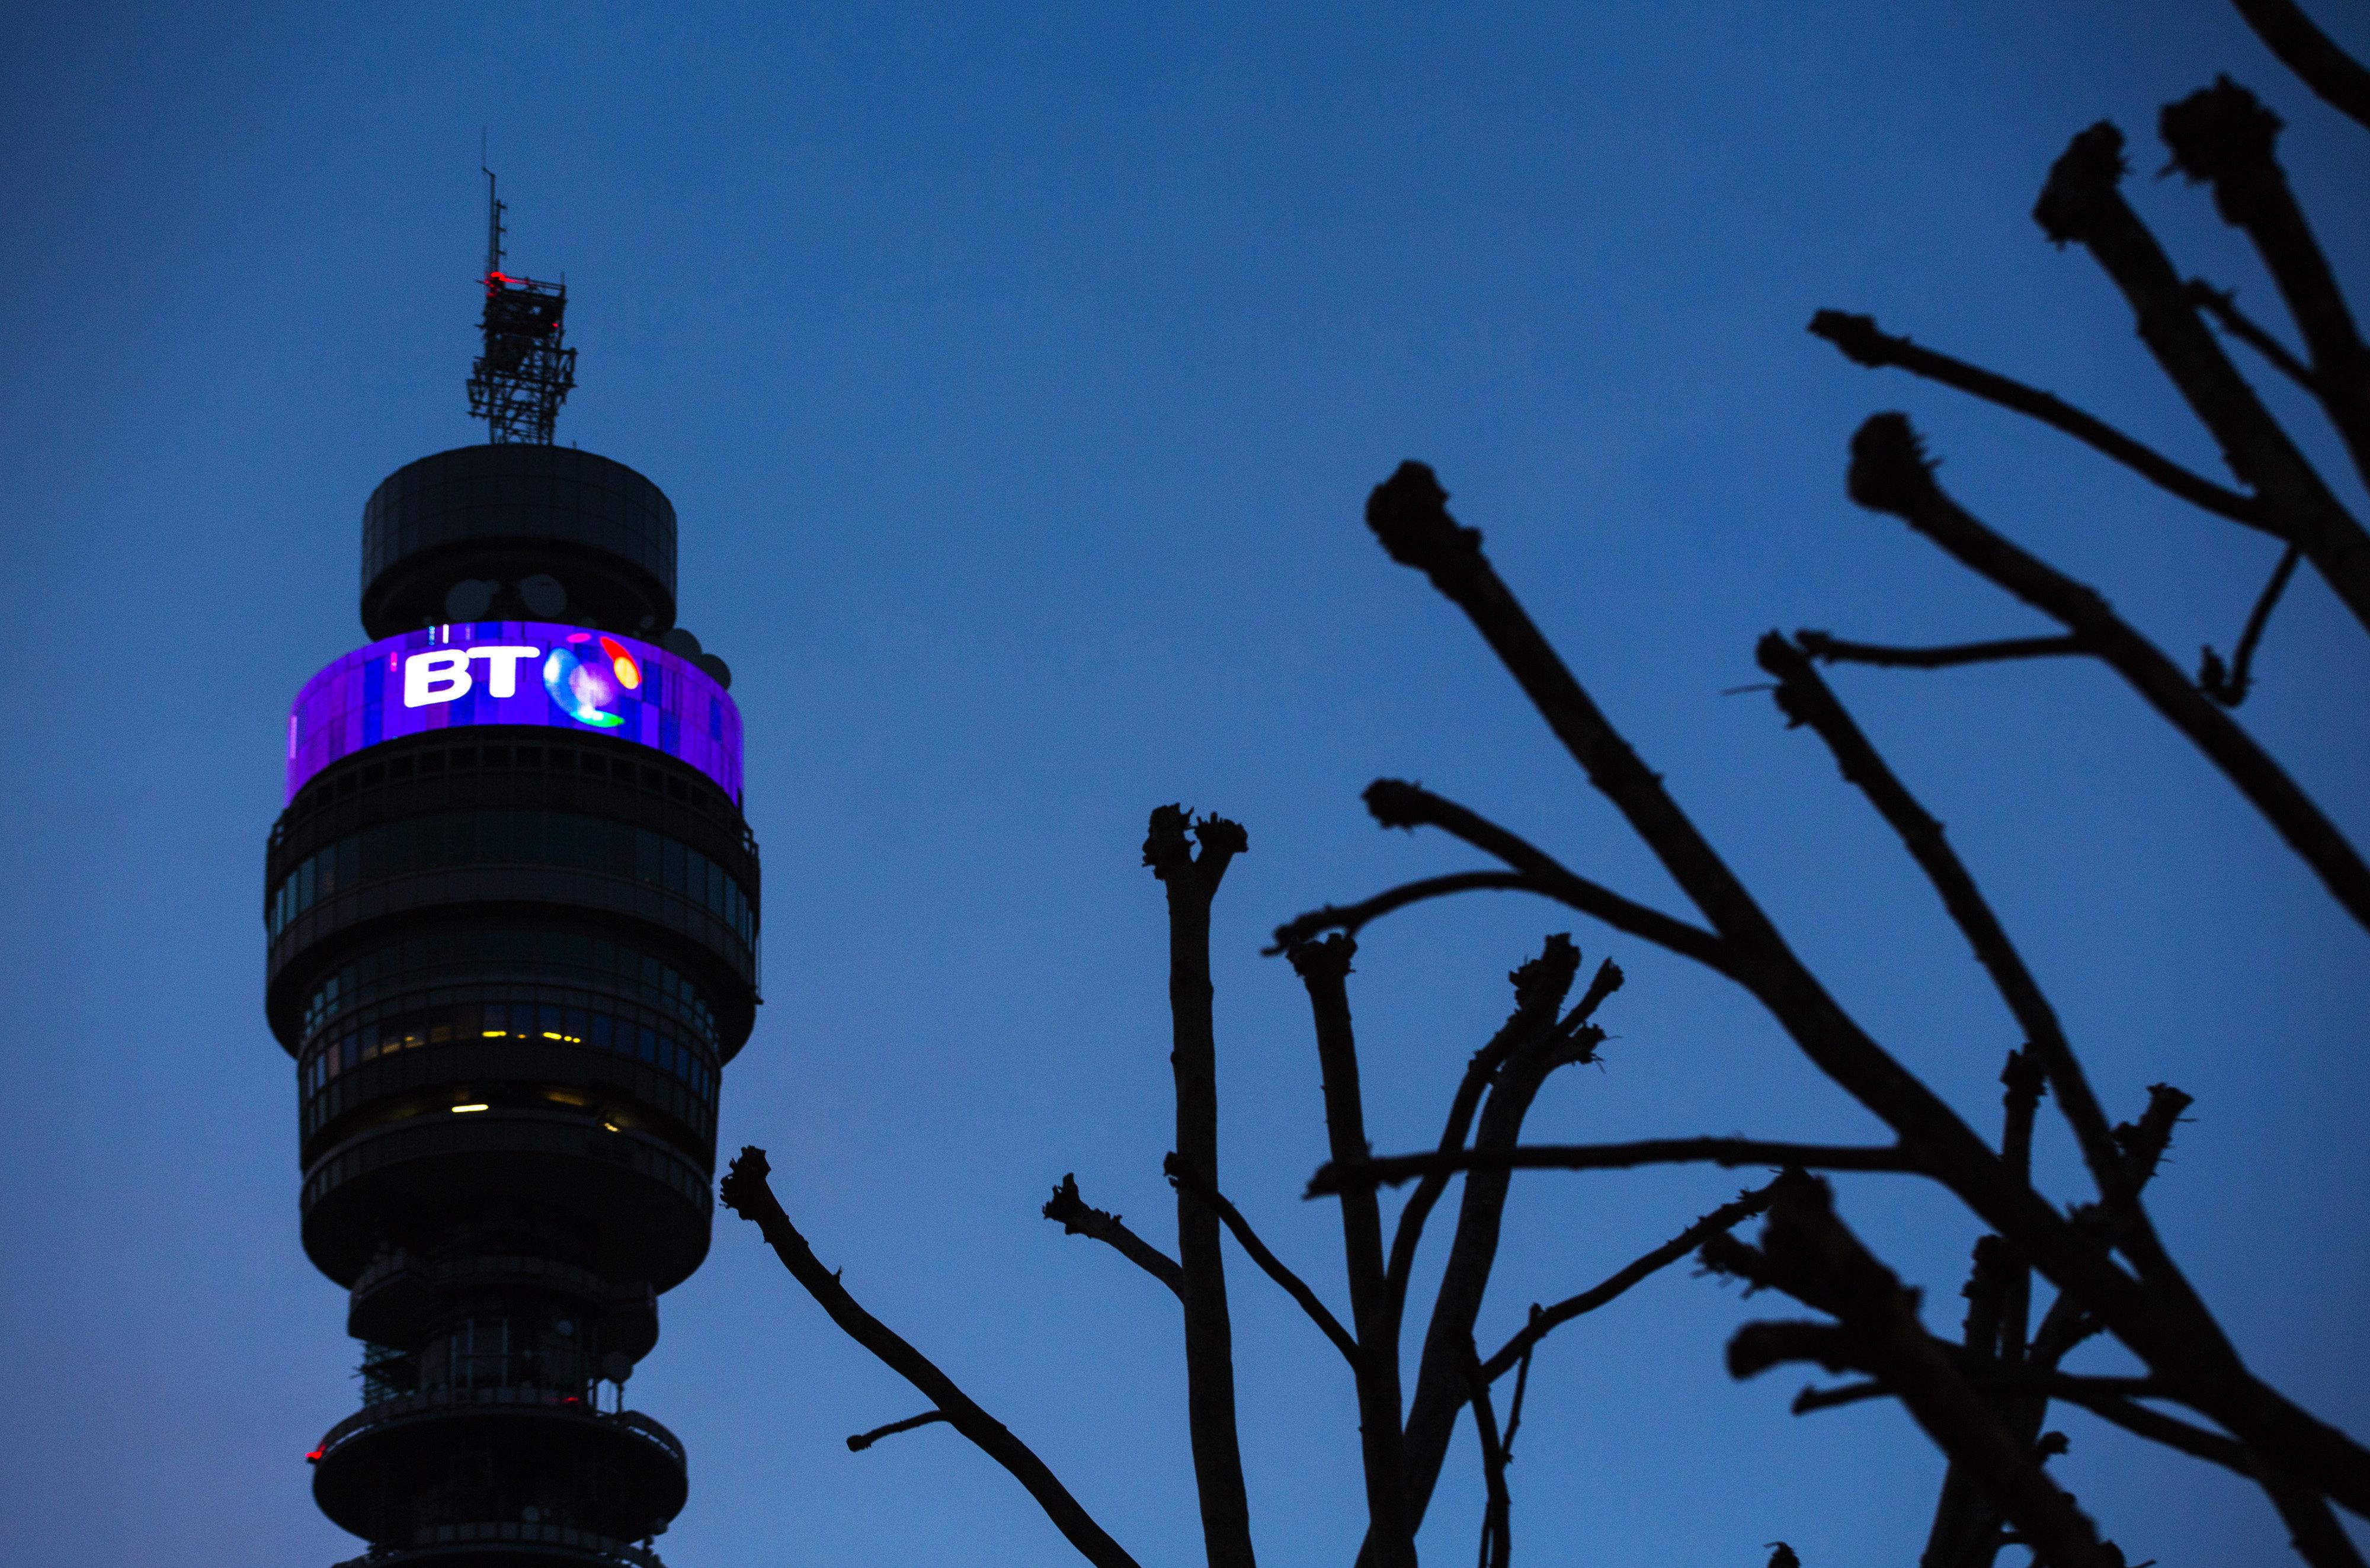 Still Get Awful Broadband Speeds? BT Has Some Good